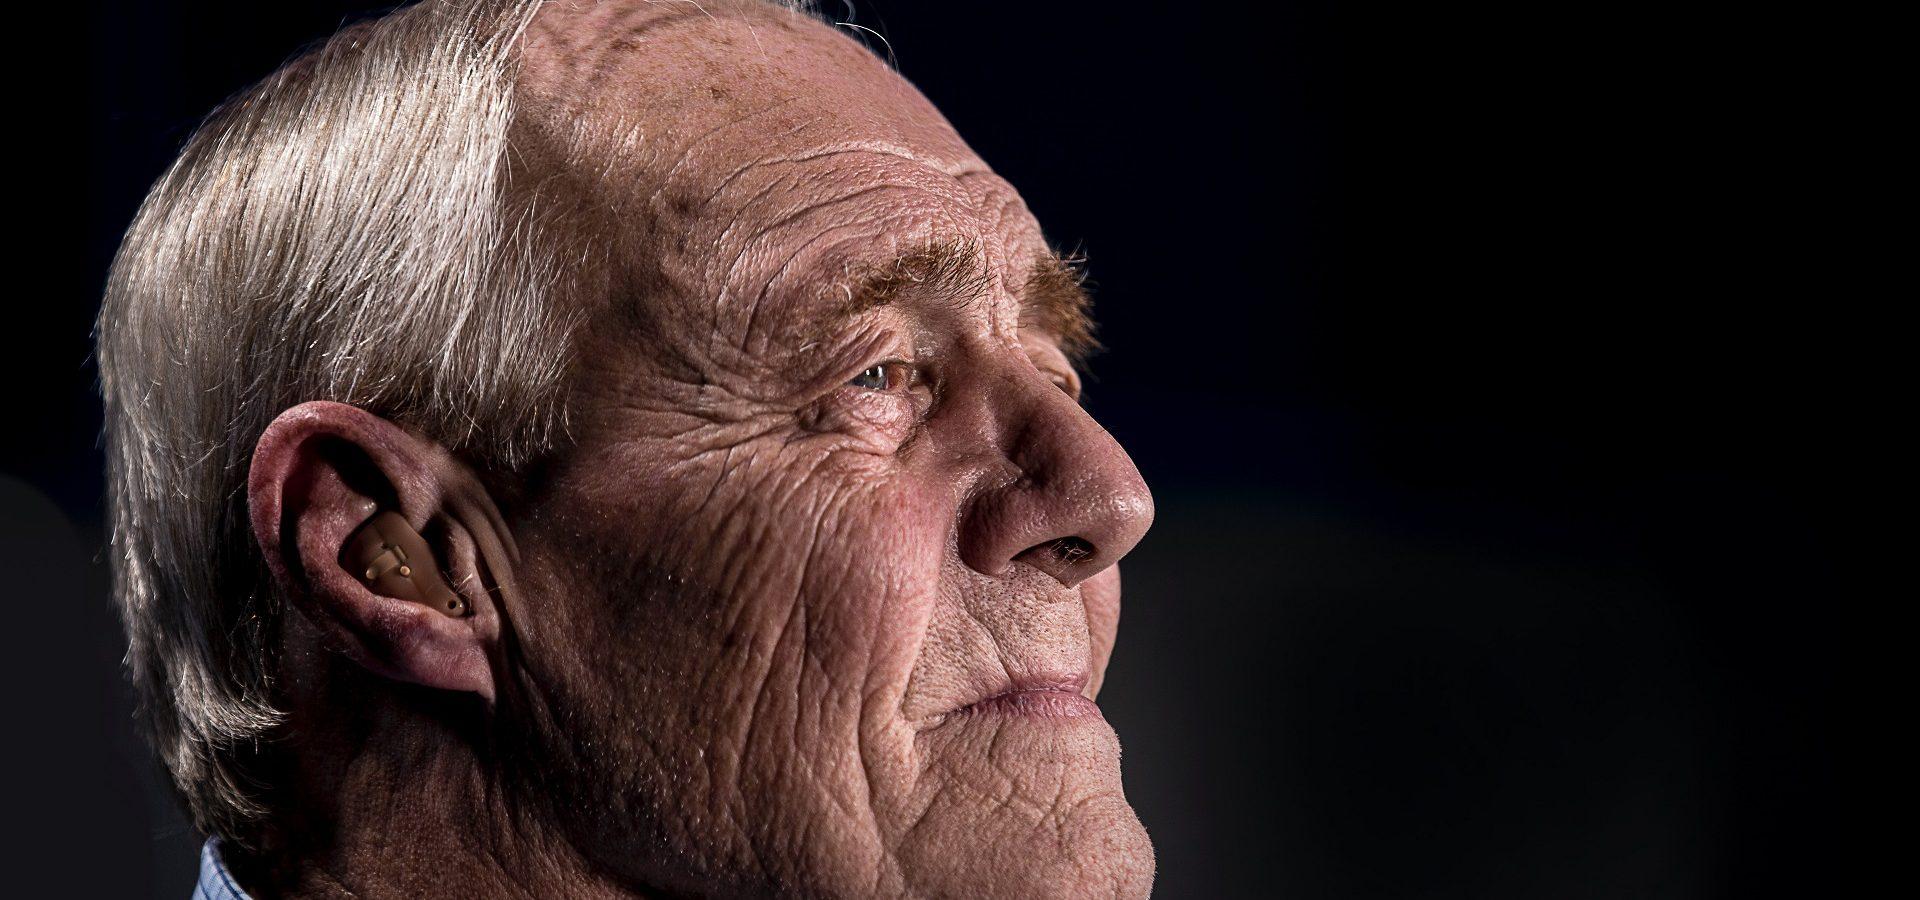 Senior man with a hearing aid